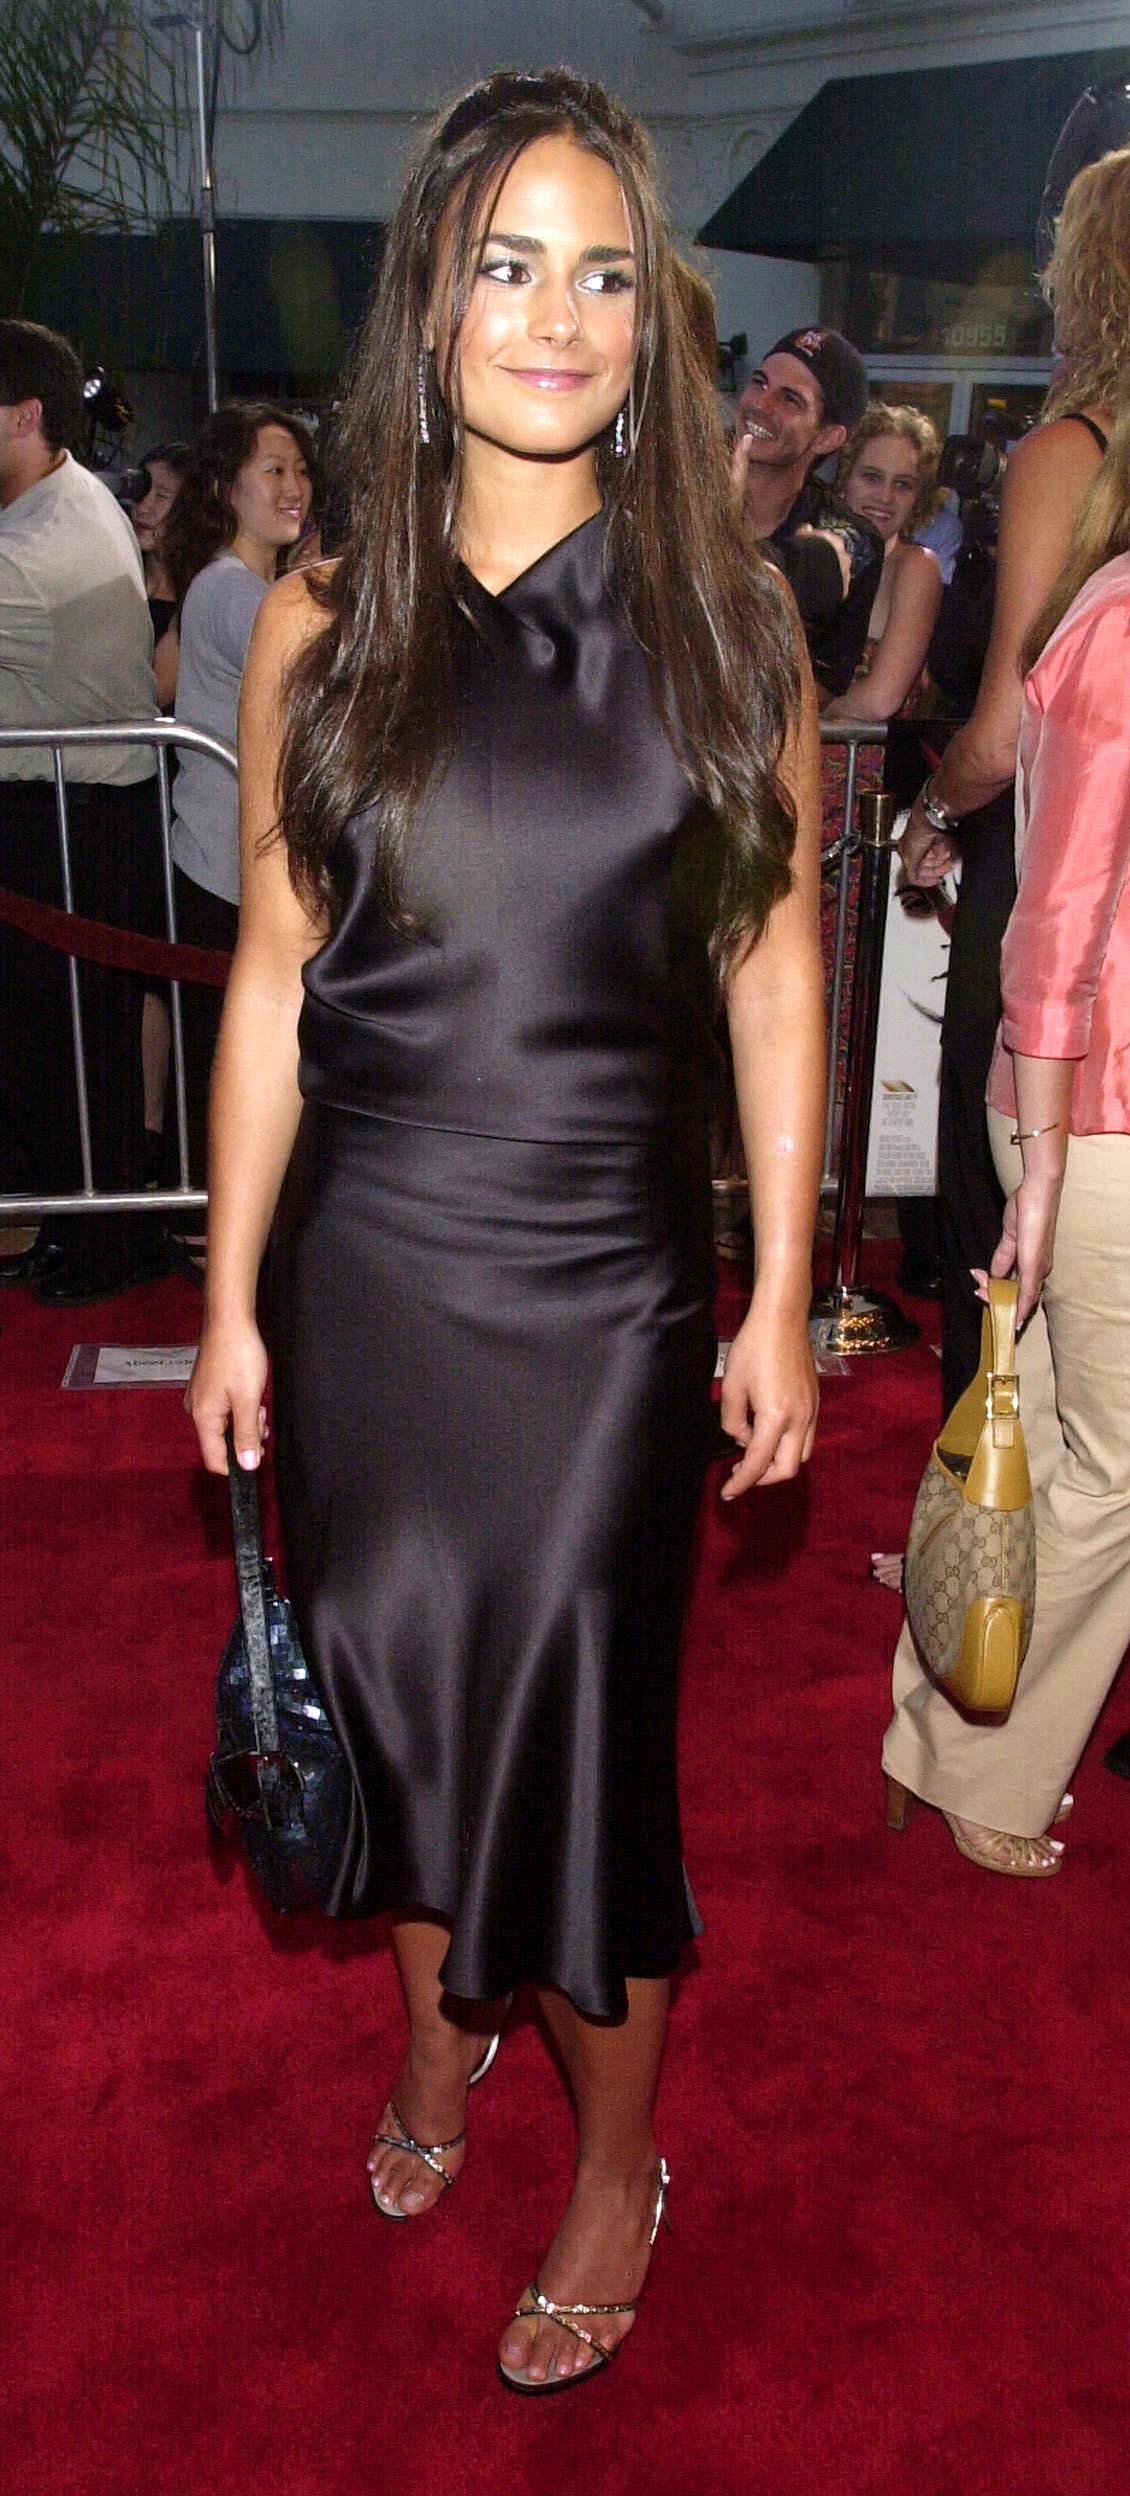 'Fast And Furious' Star Jordana Brewster Settles Divorce With Ex-Husband